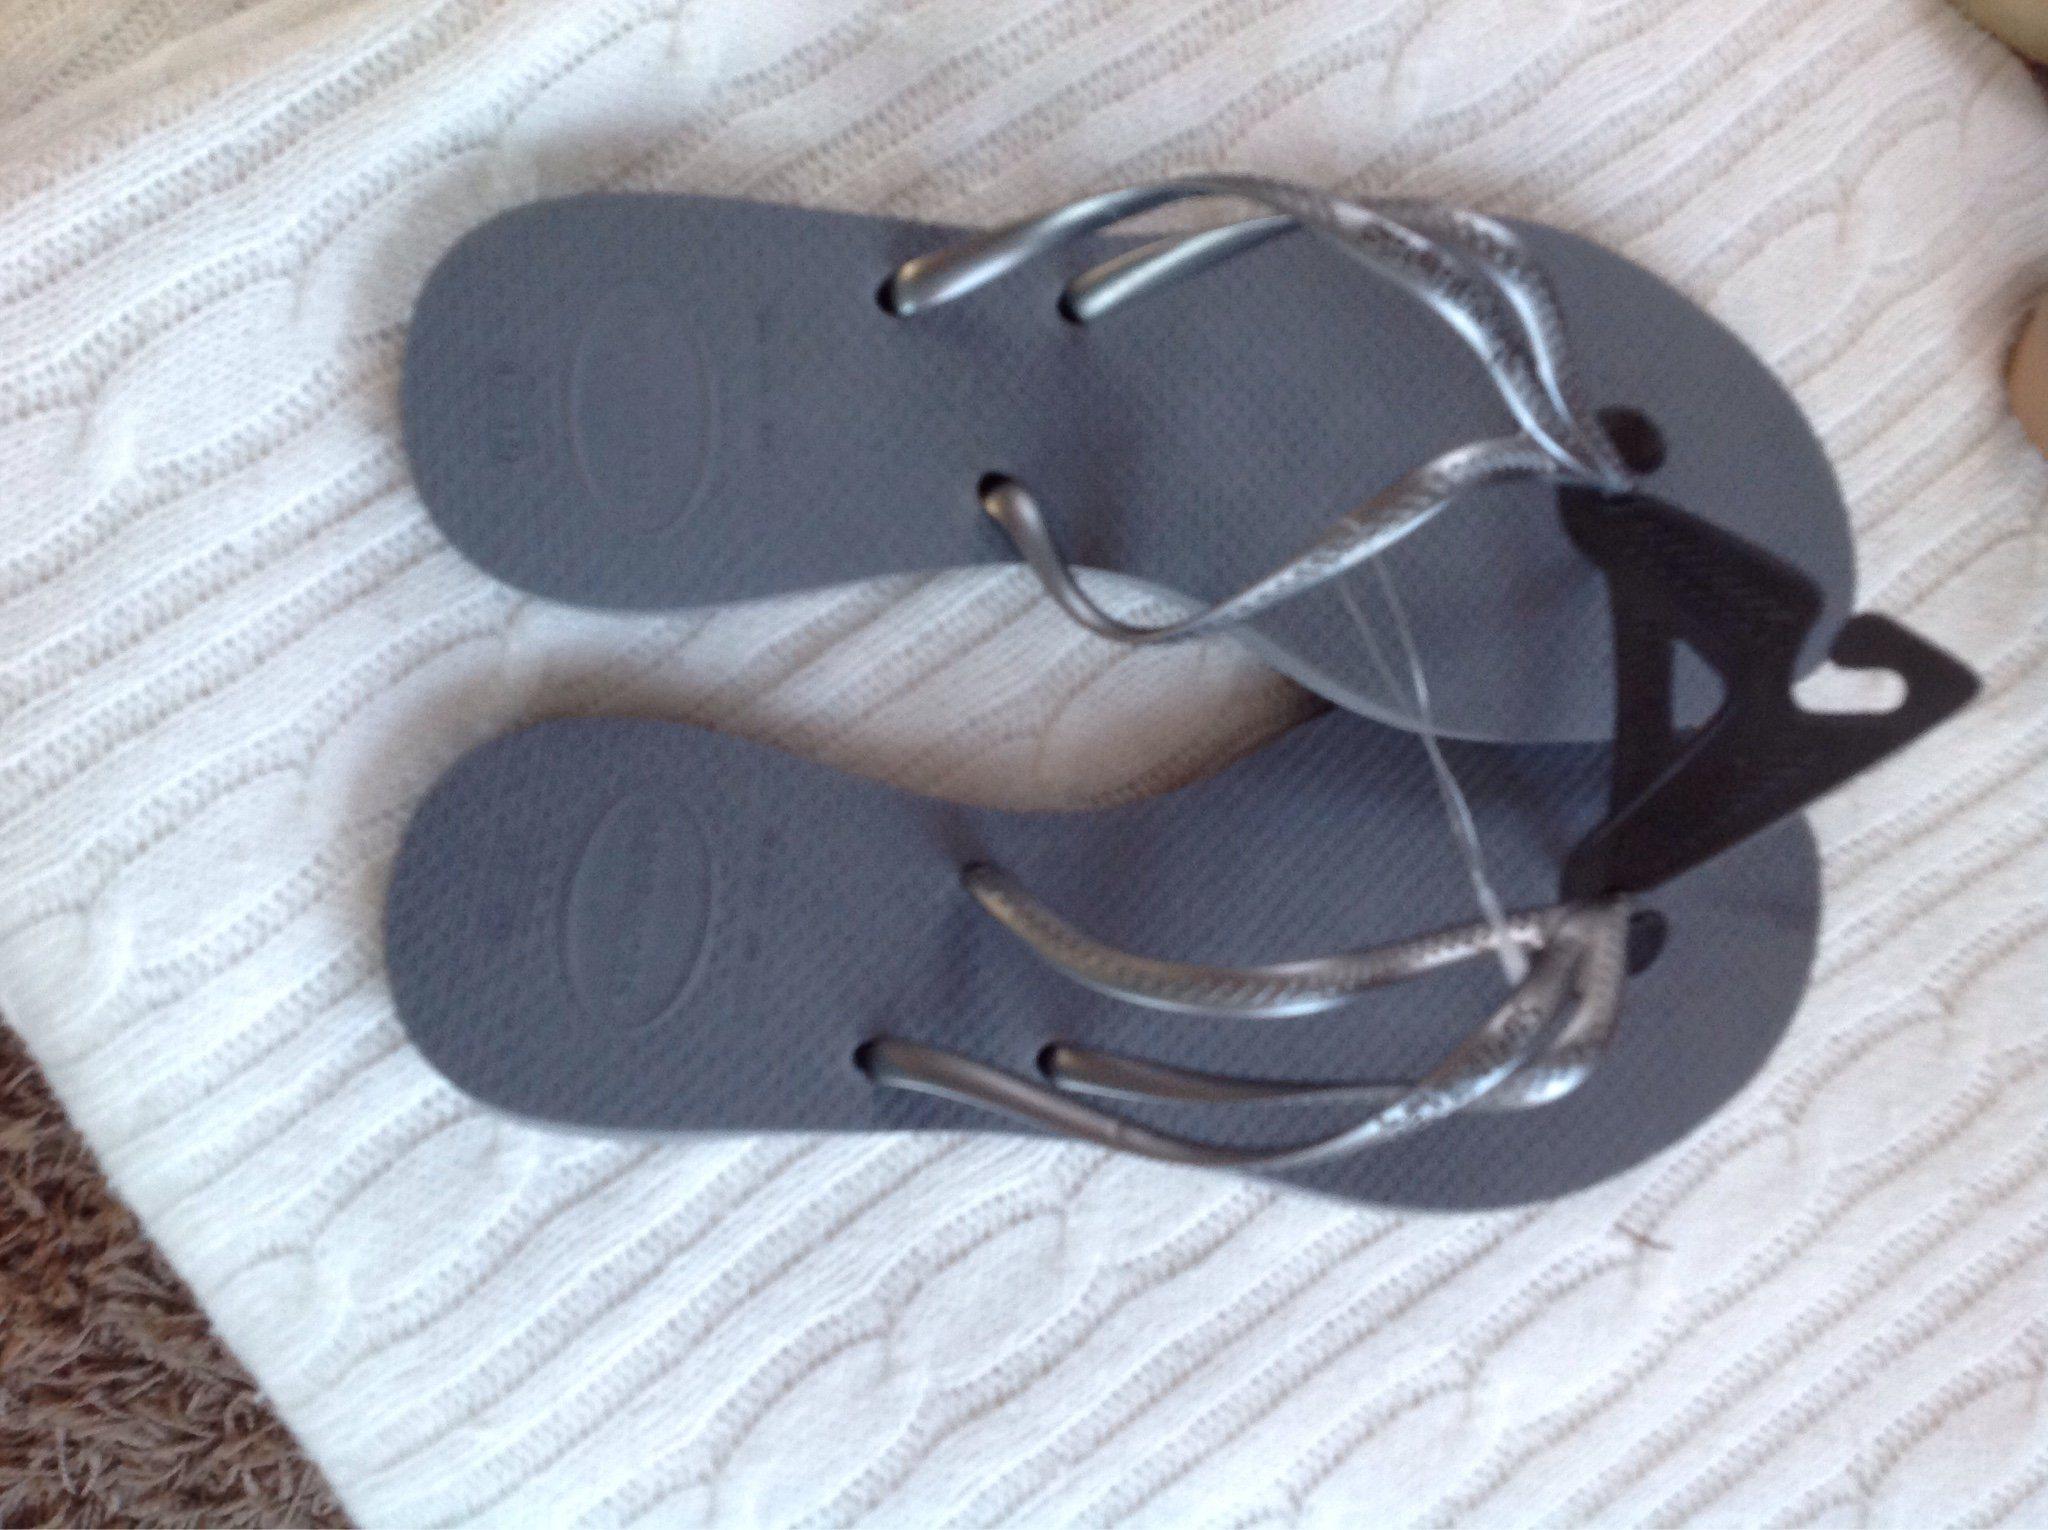 outlet store 022bc f7c2e Snygga flip-flop sandaler Havaianas till bra pris!